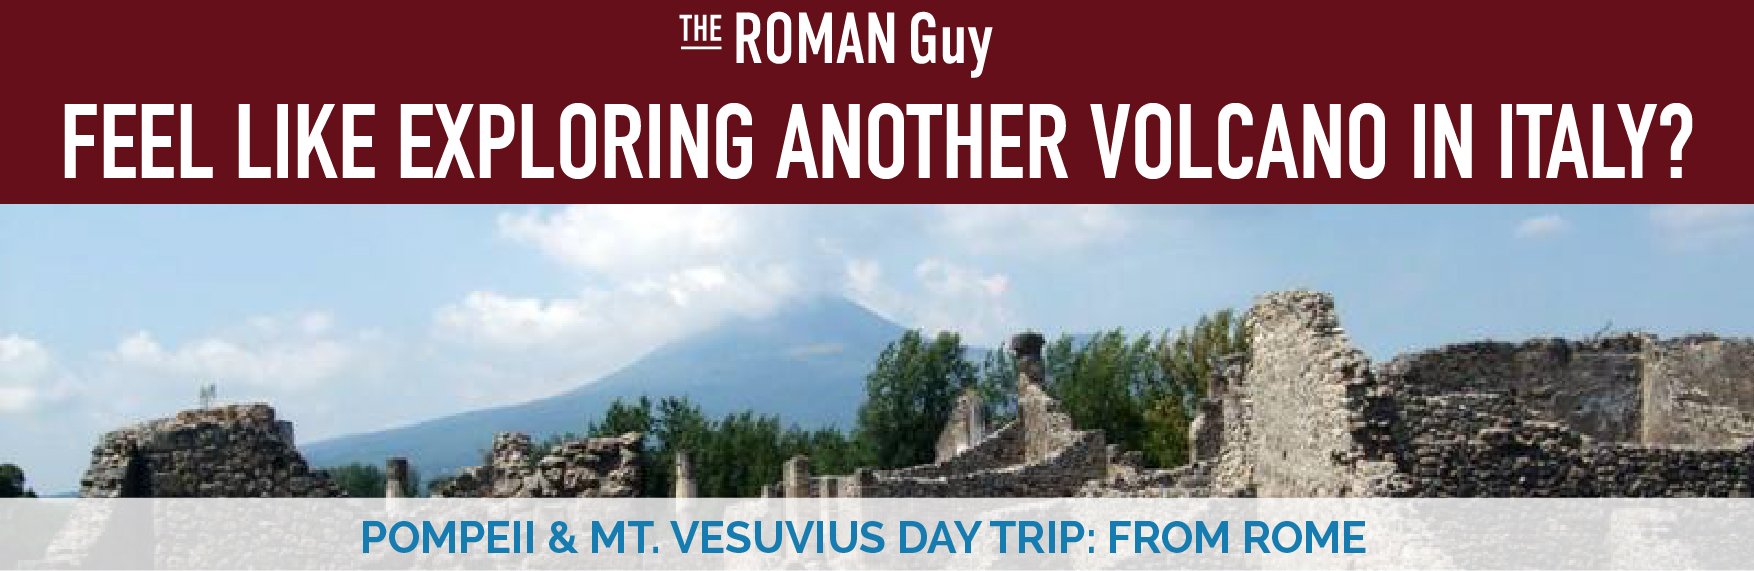 Day Trip from Rome - Mount Vesuvius and Pompeii